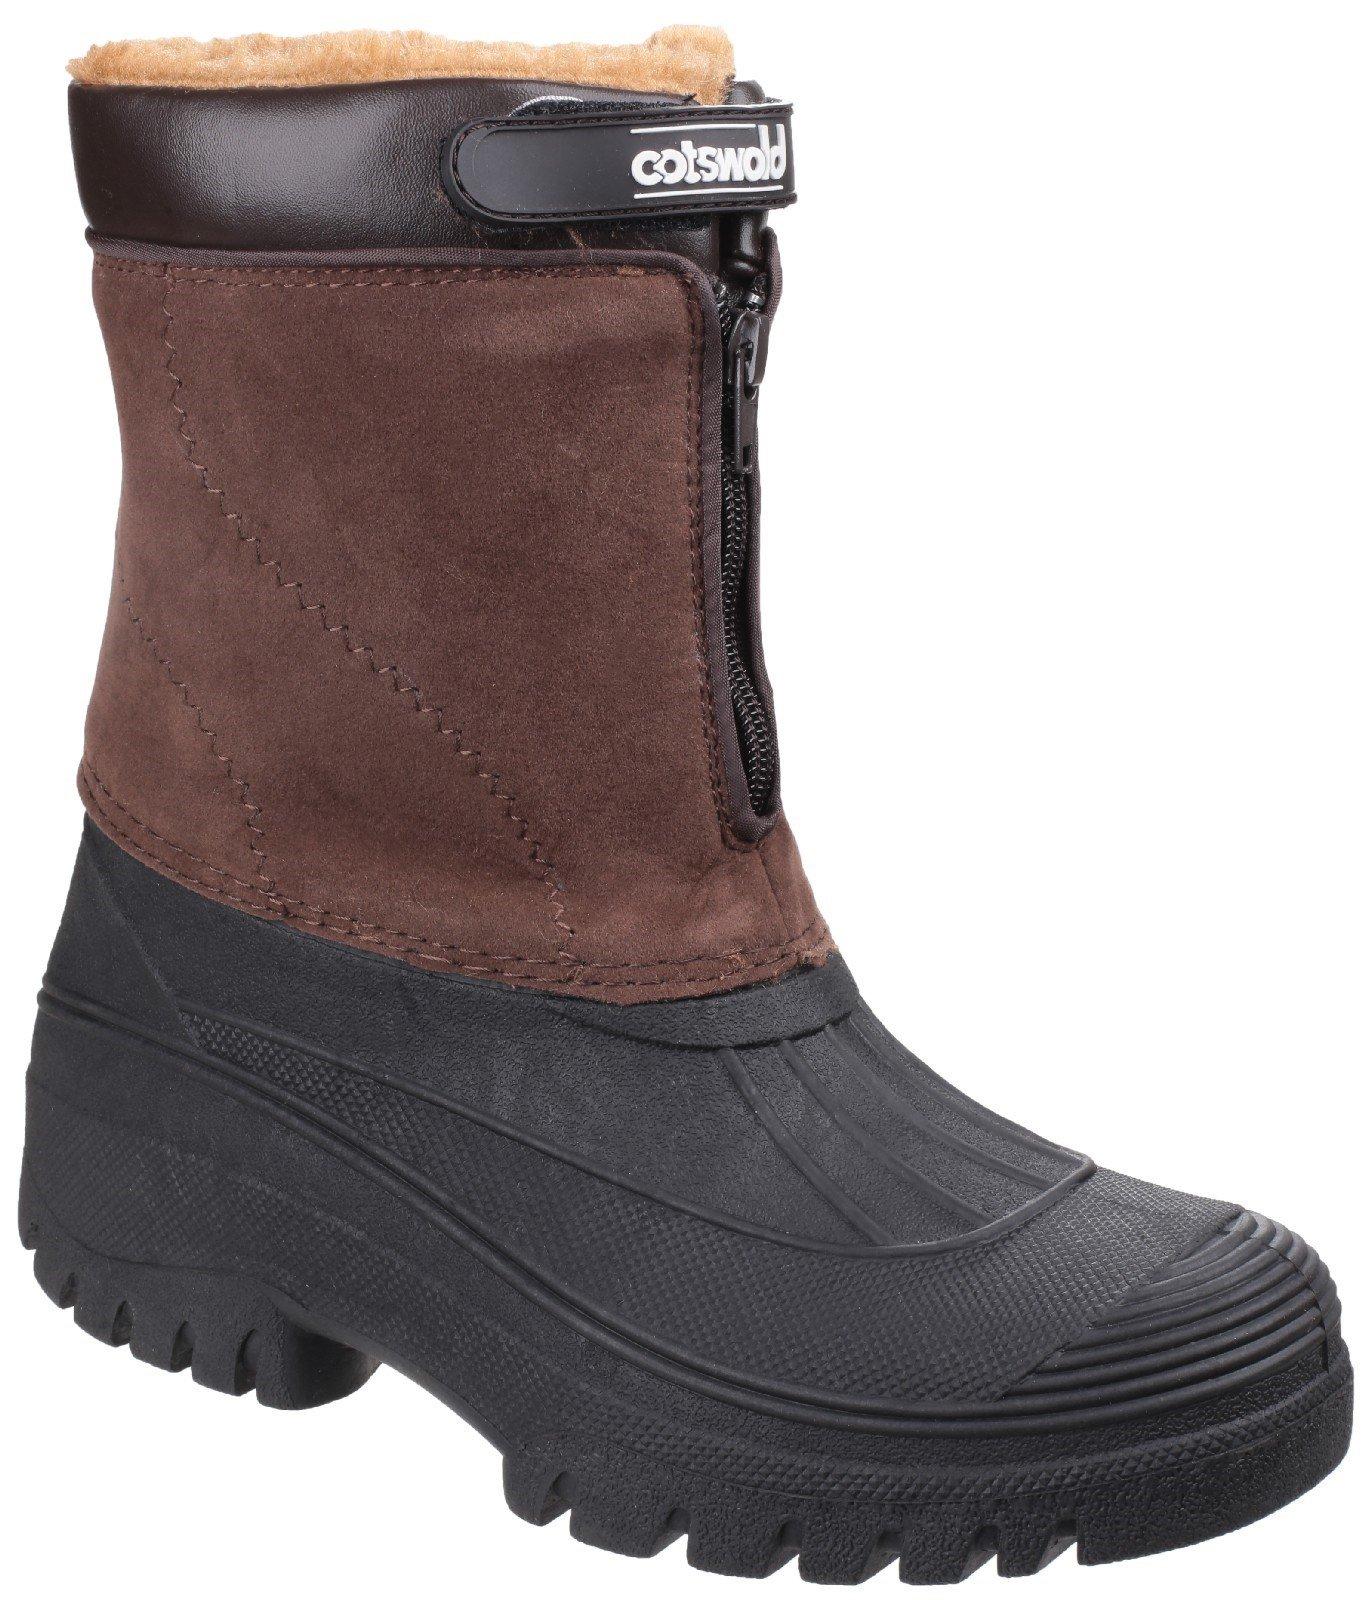 Cotswold Women's Venture Waterproof Winter Boot Various Colours 16569 - Brown 2